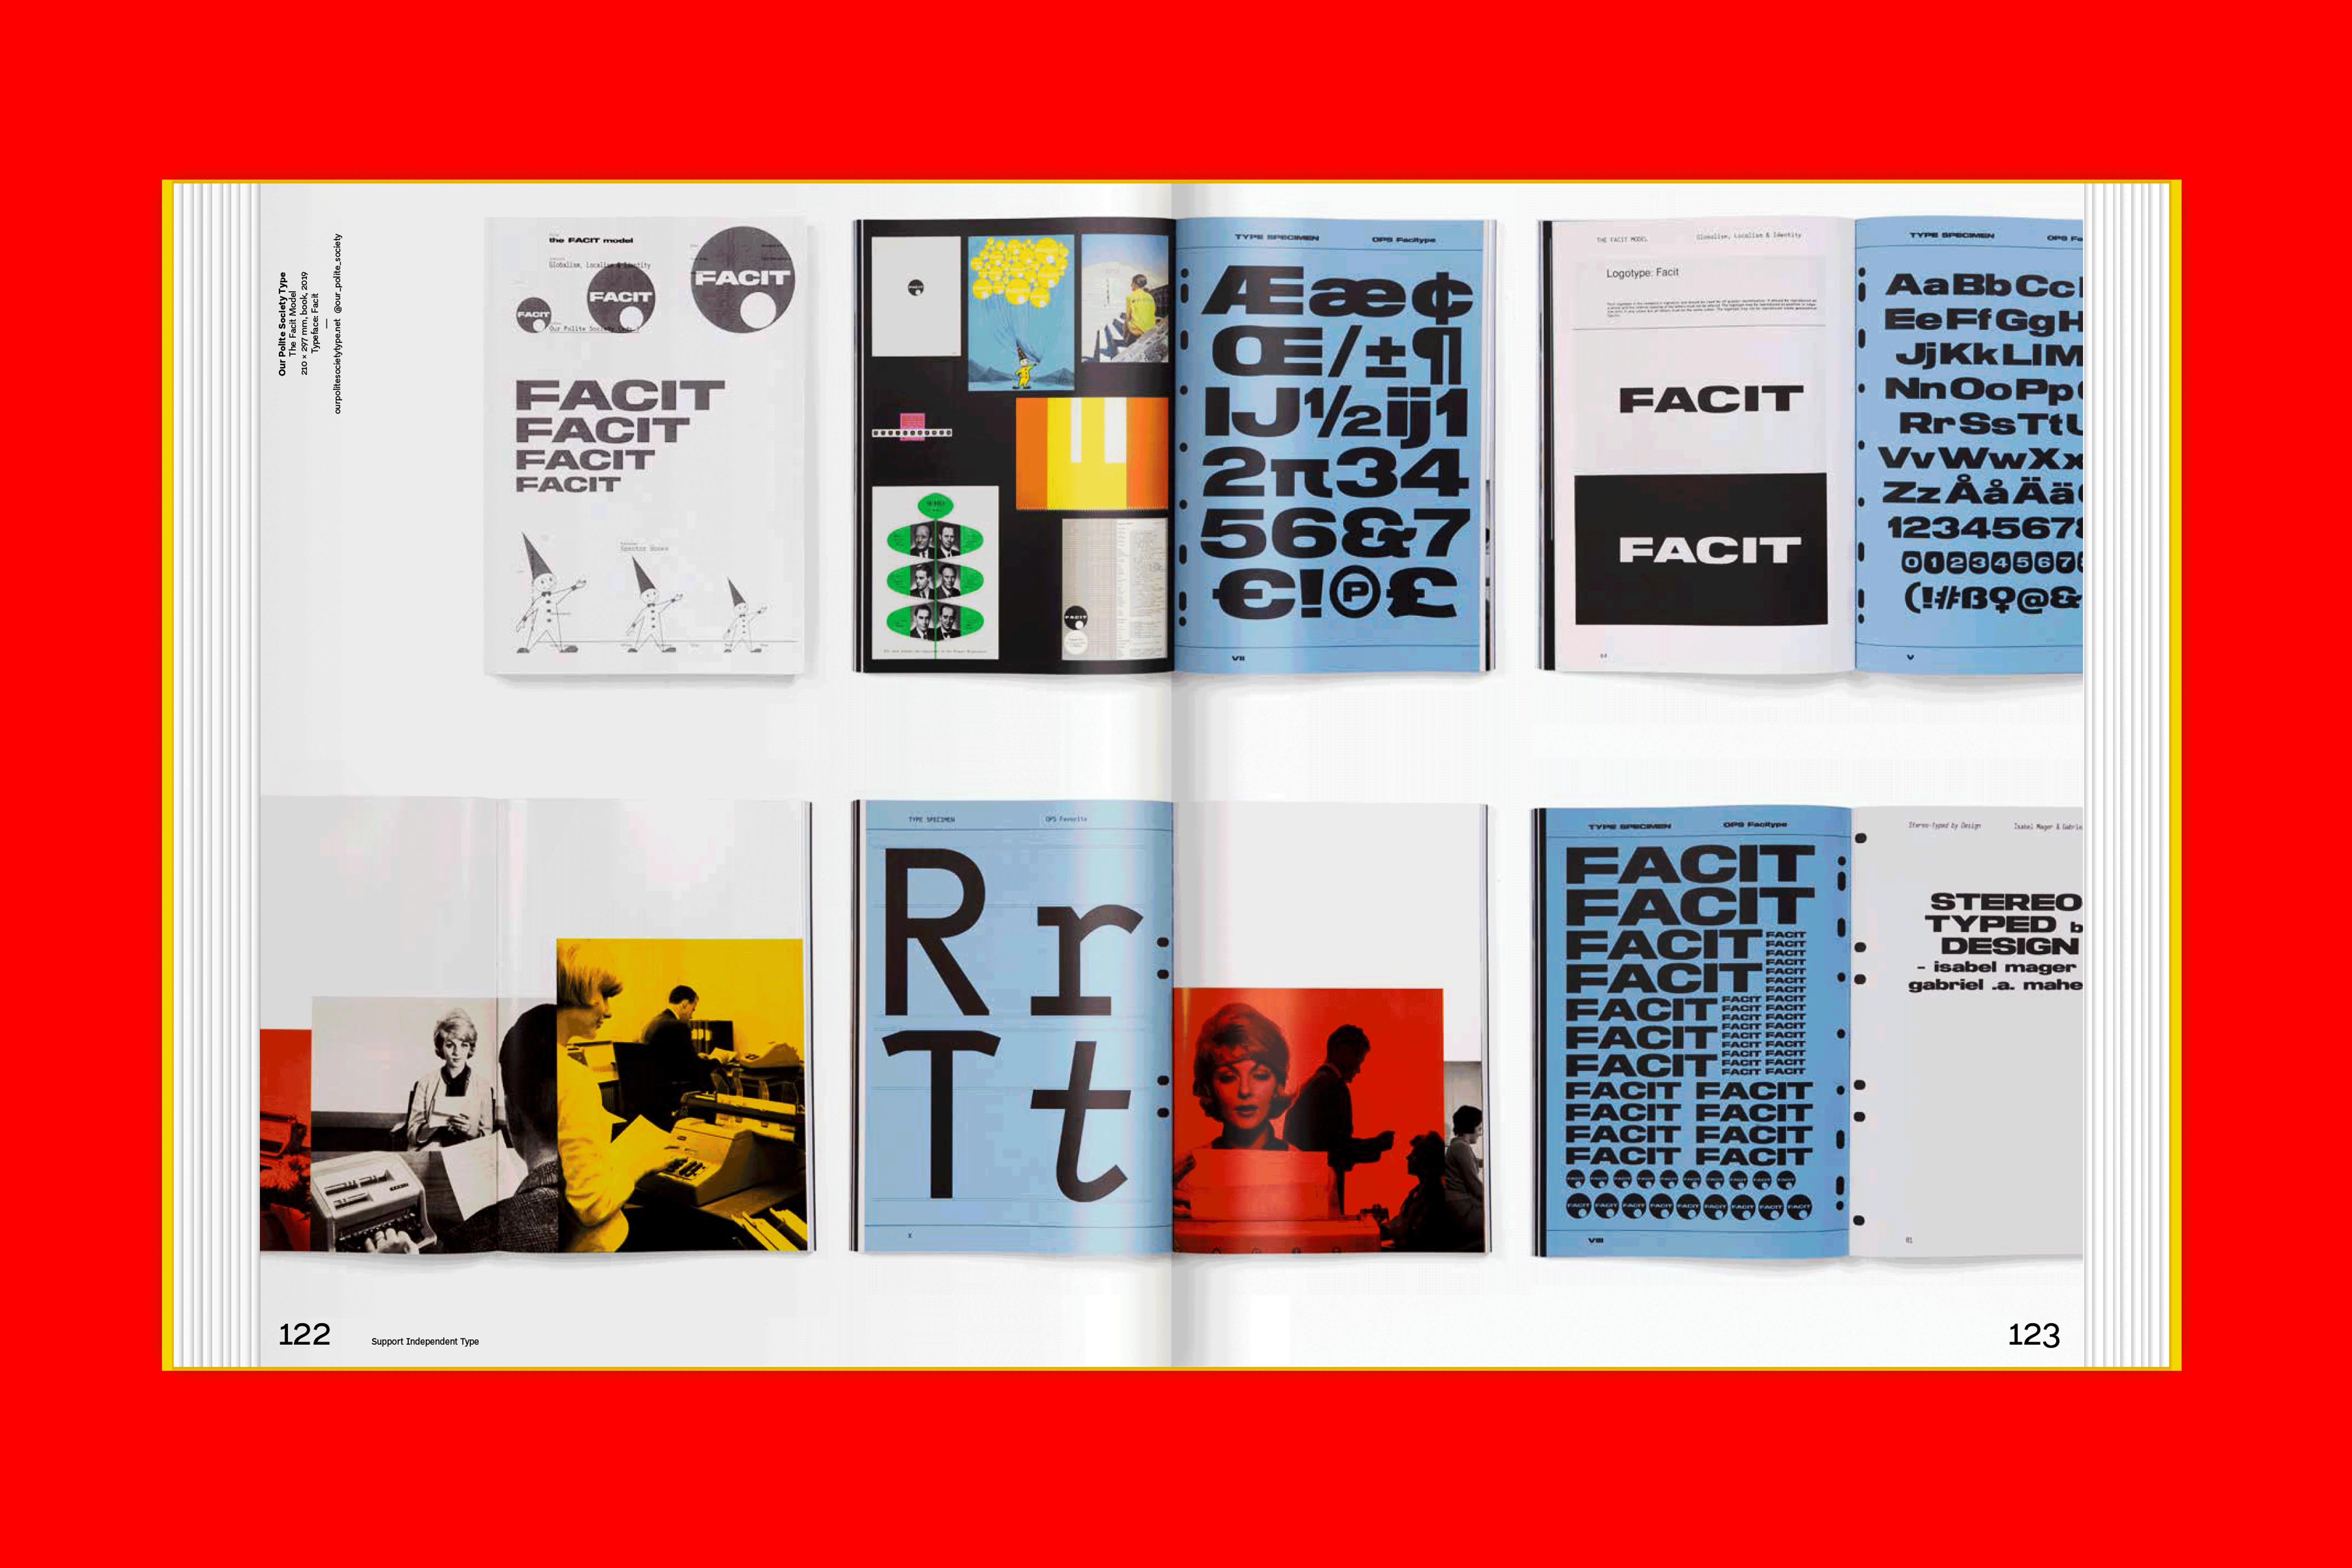 Slanted-Publiaktionen-Slanted-Publishers-Support-Independent-Type_19